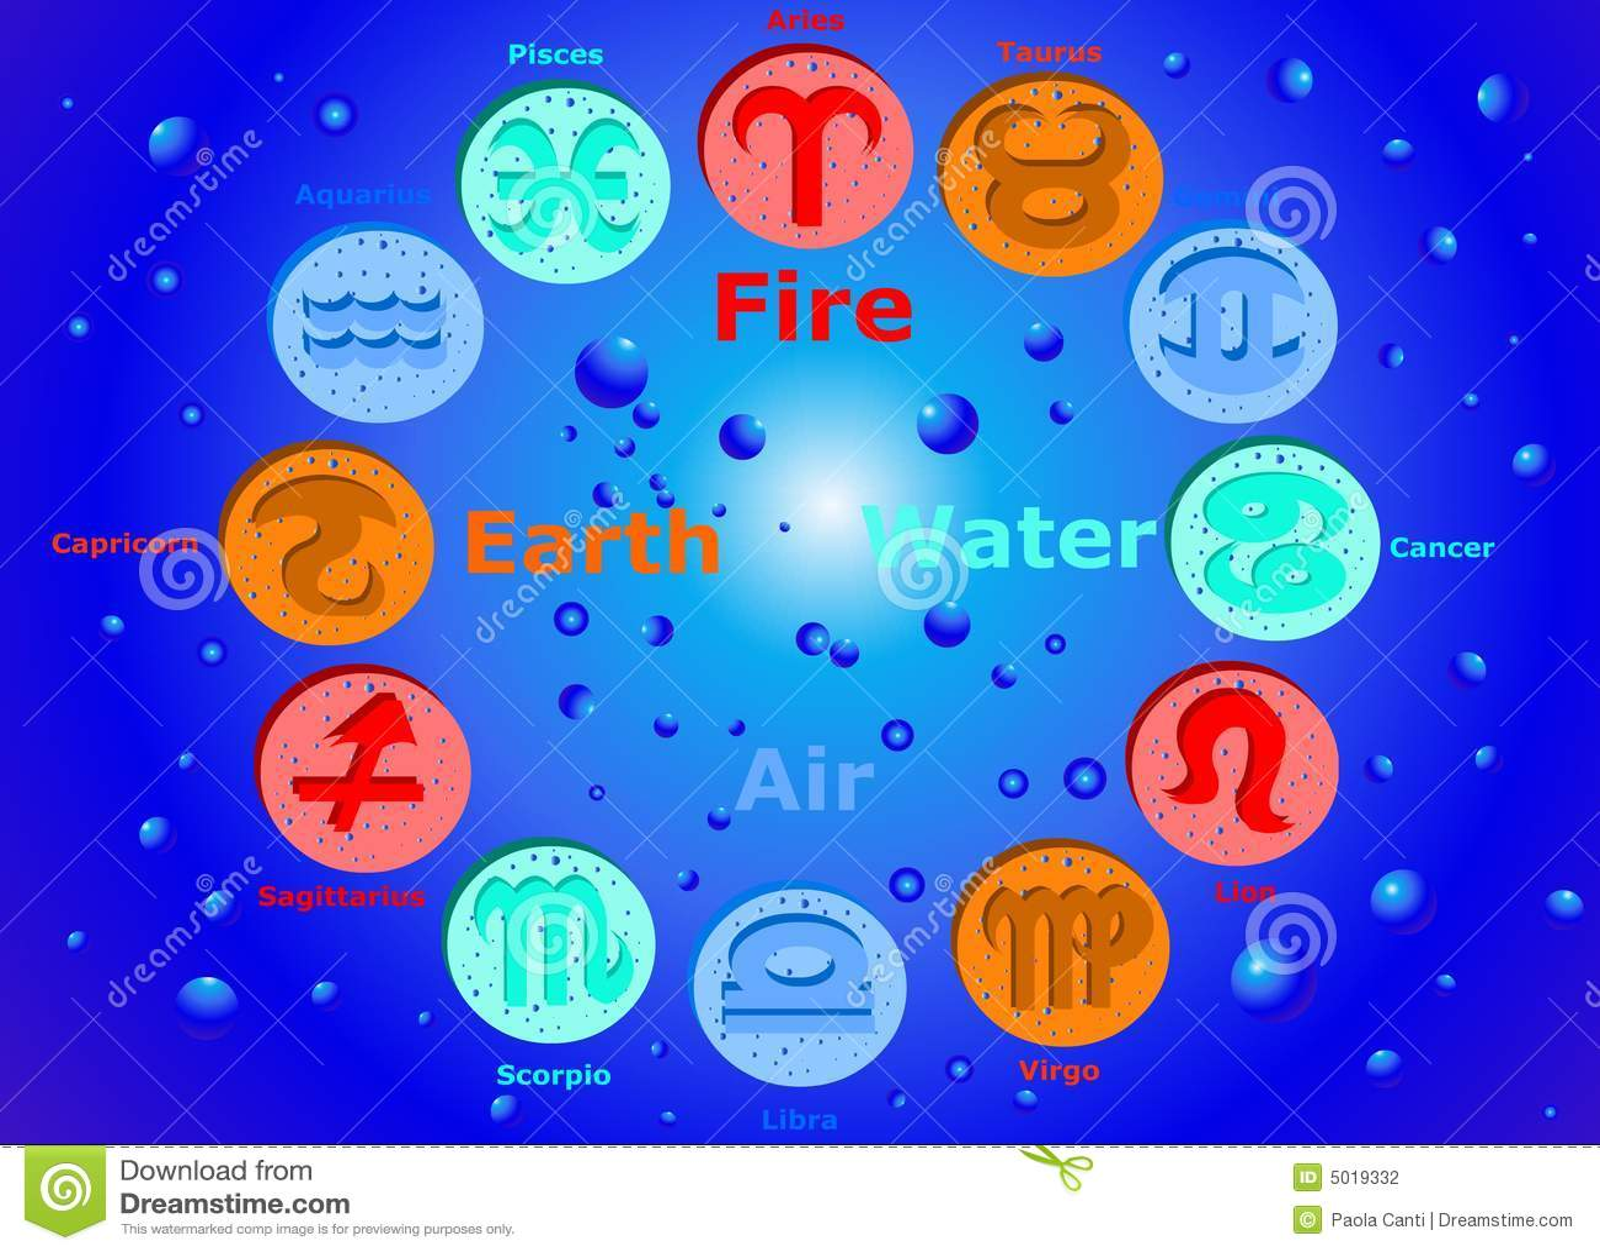 Horoscope 12 Zodiac Signs Elements Stock Illustration